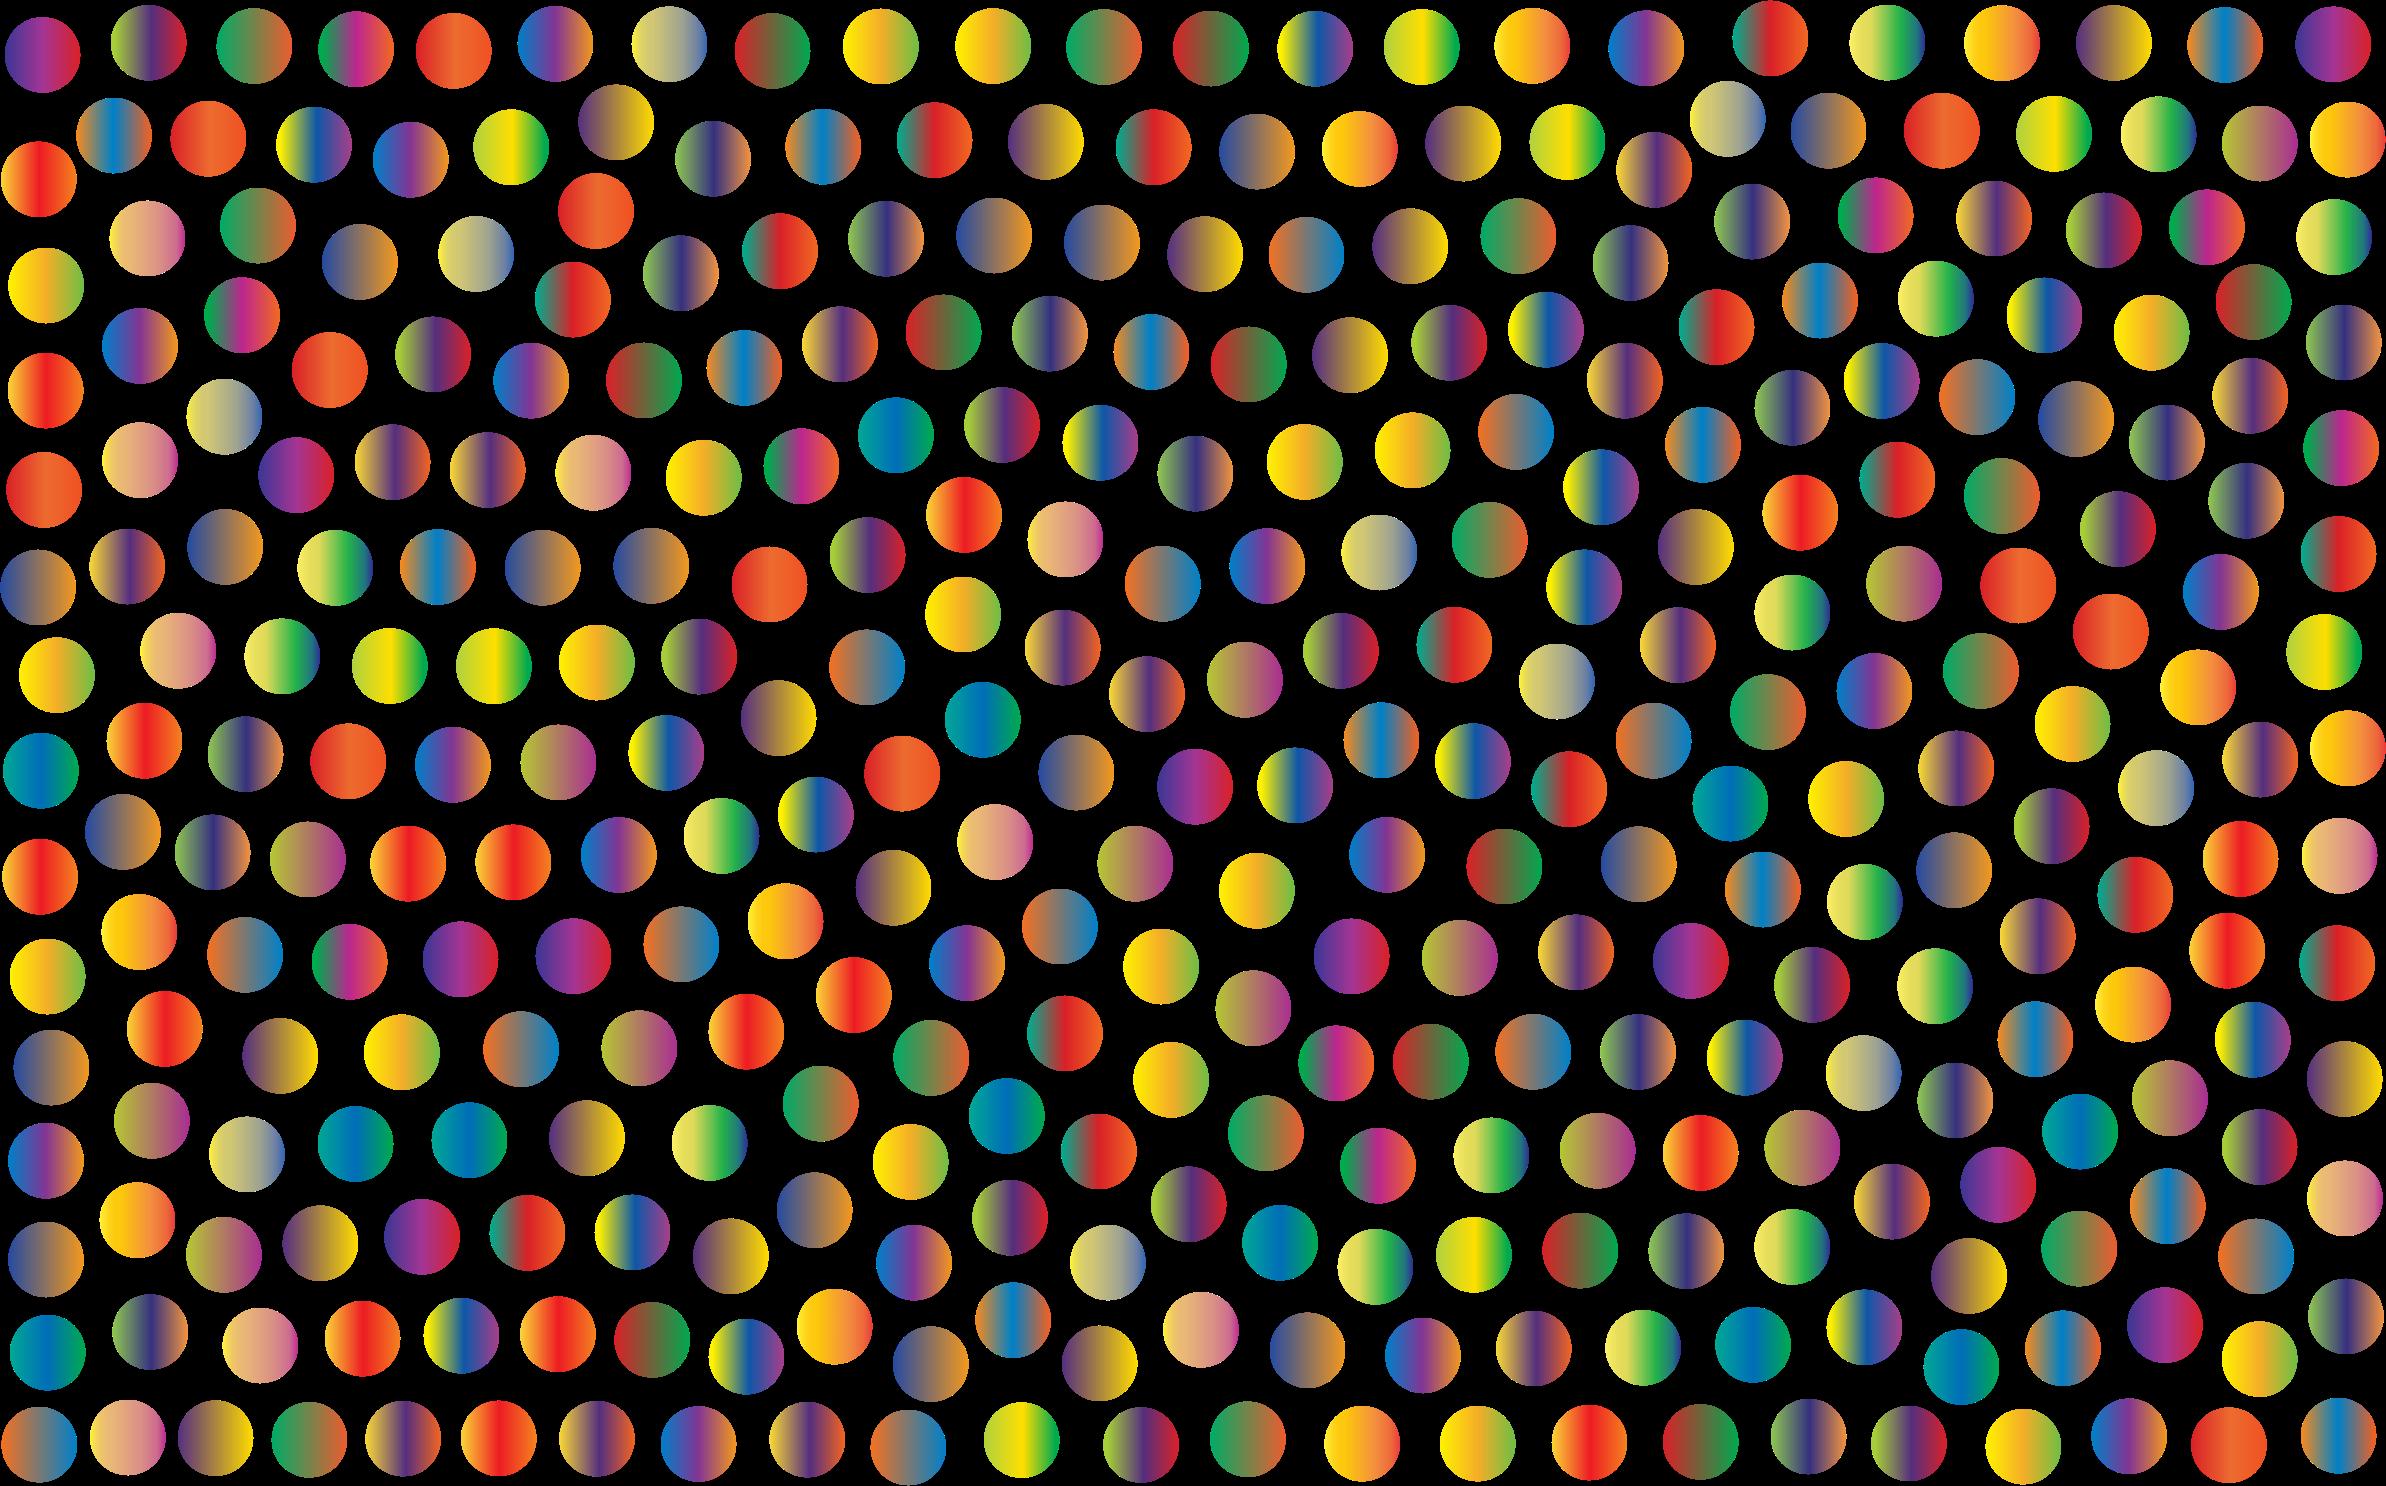 lines clipart polka dot